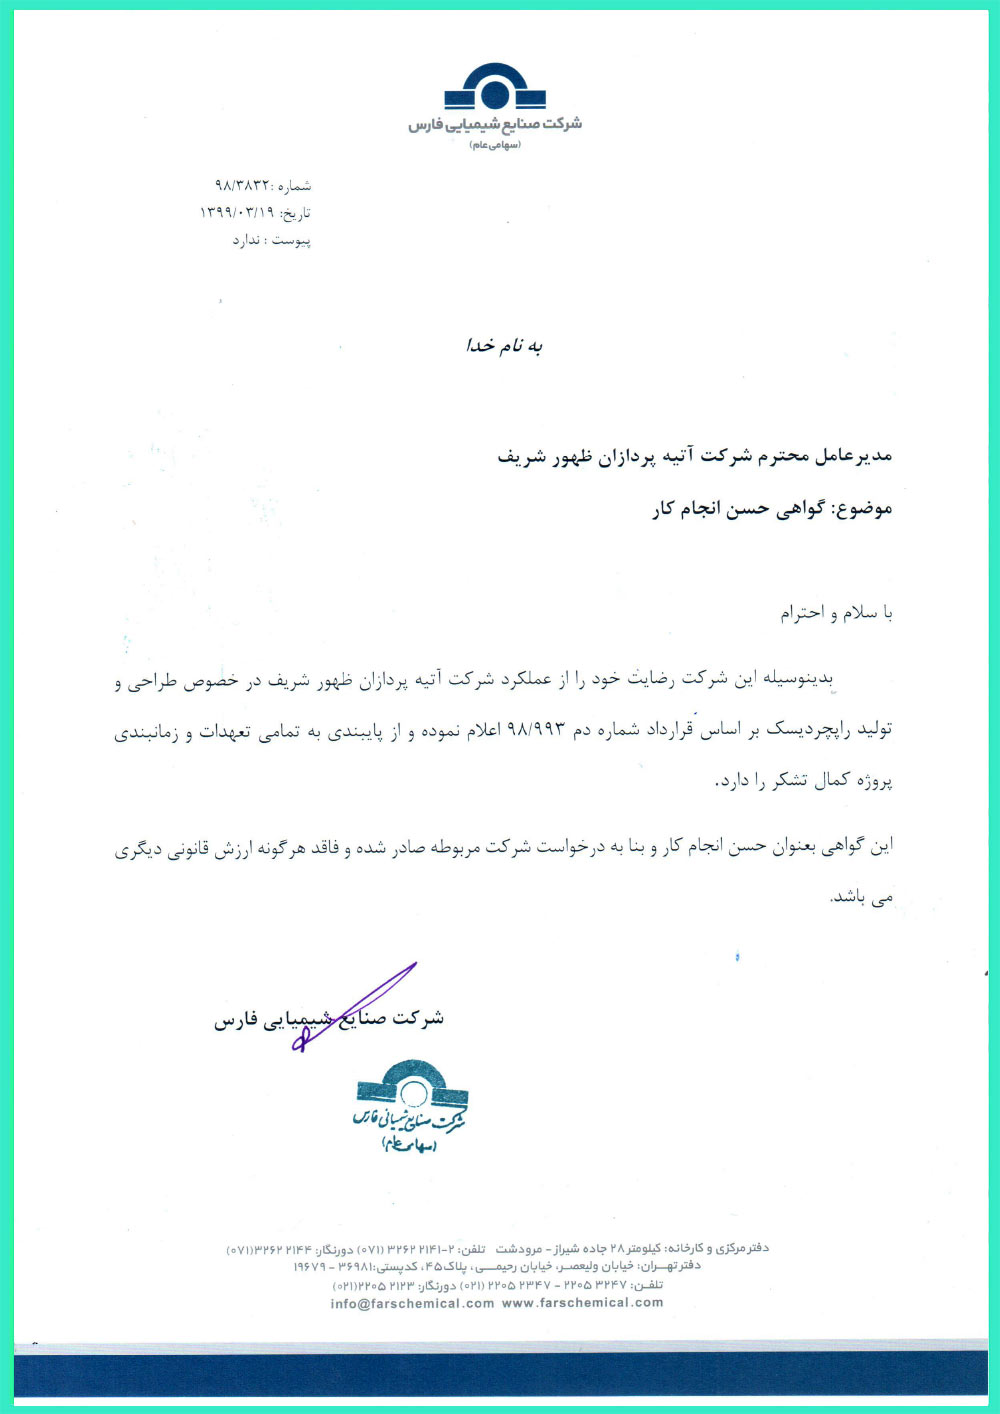 صنایع-شیمیایی-فارس